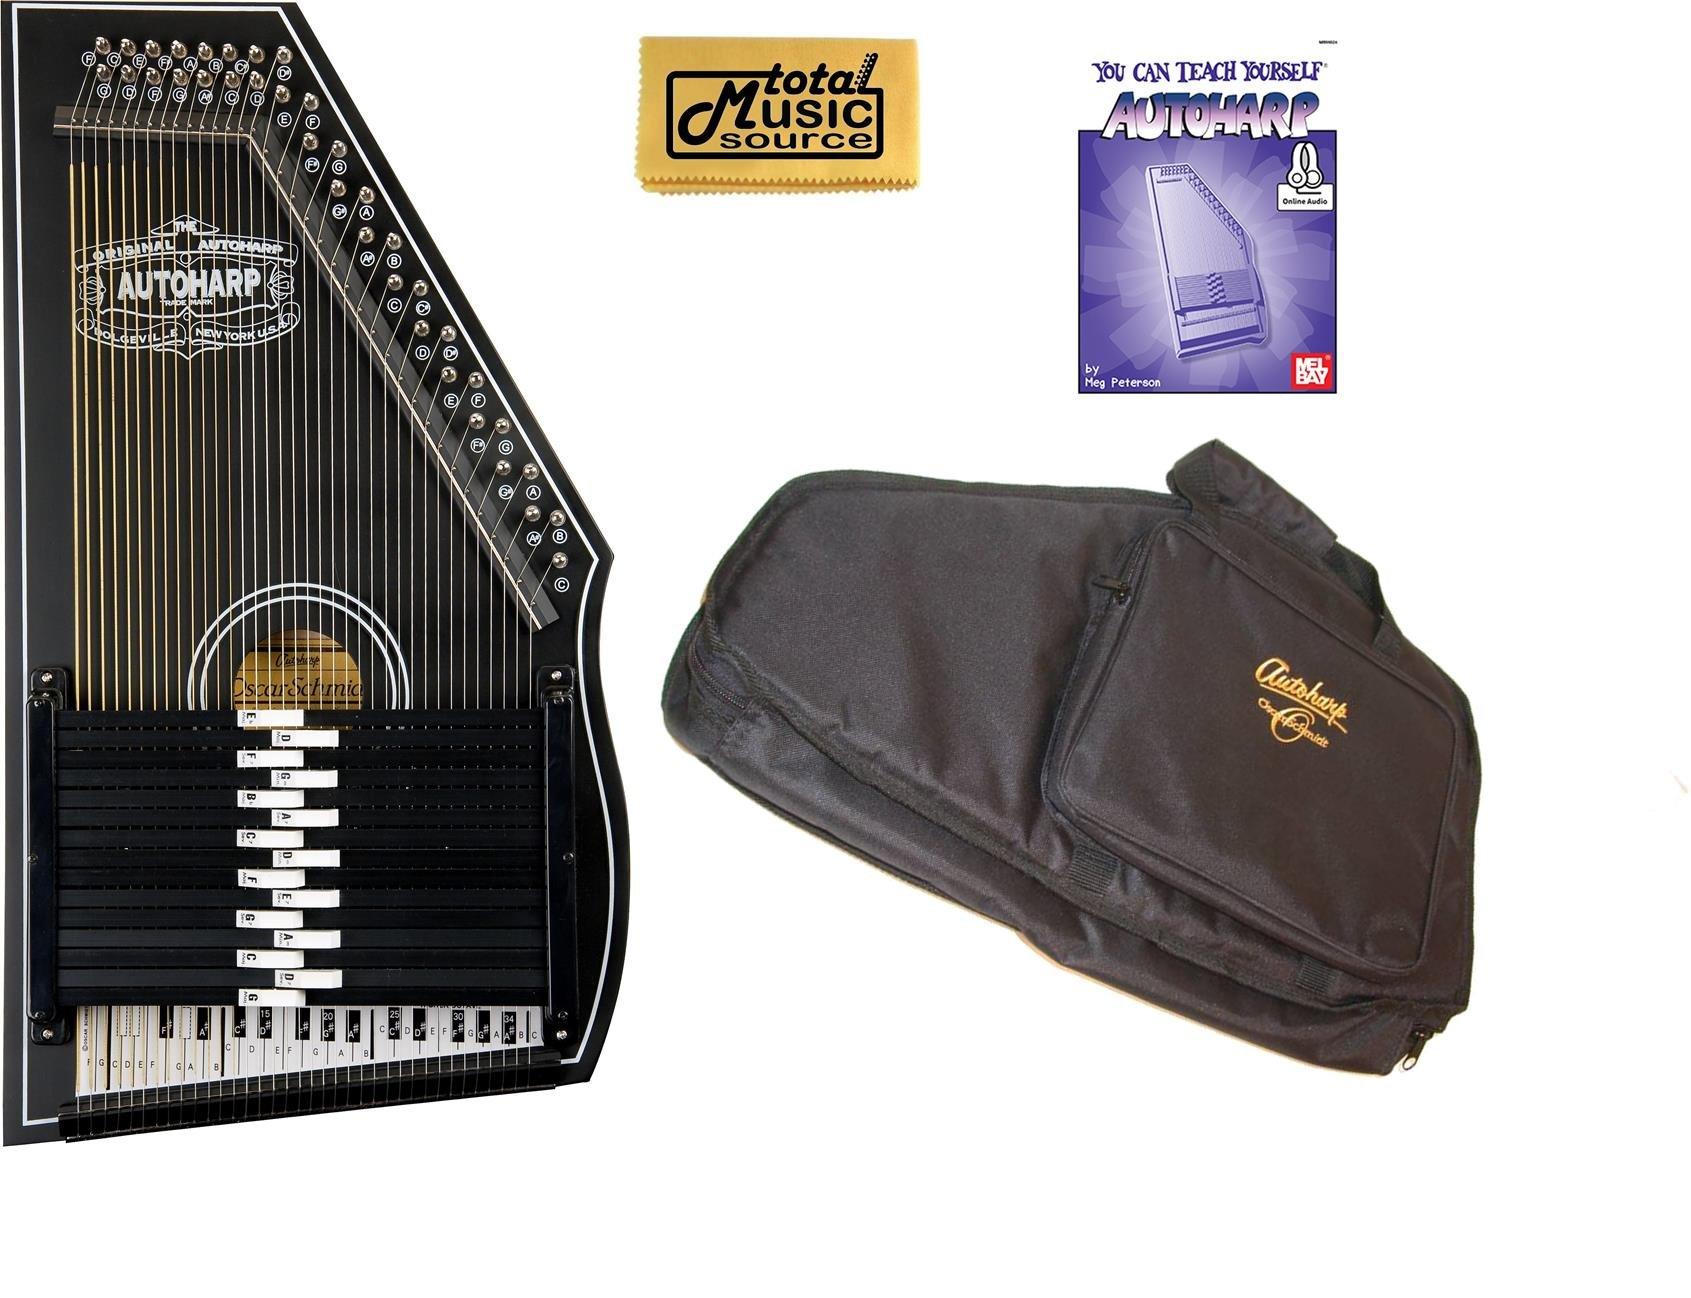 Oscar Schmidt 1930's Reissue 15 Chord Autoharp, Original Design, Black, OS73B Bundle, OS73B AC445PACK